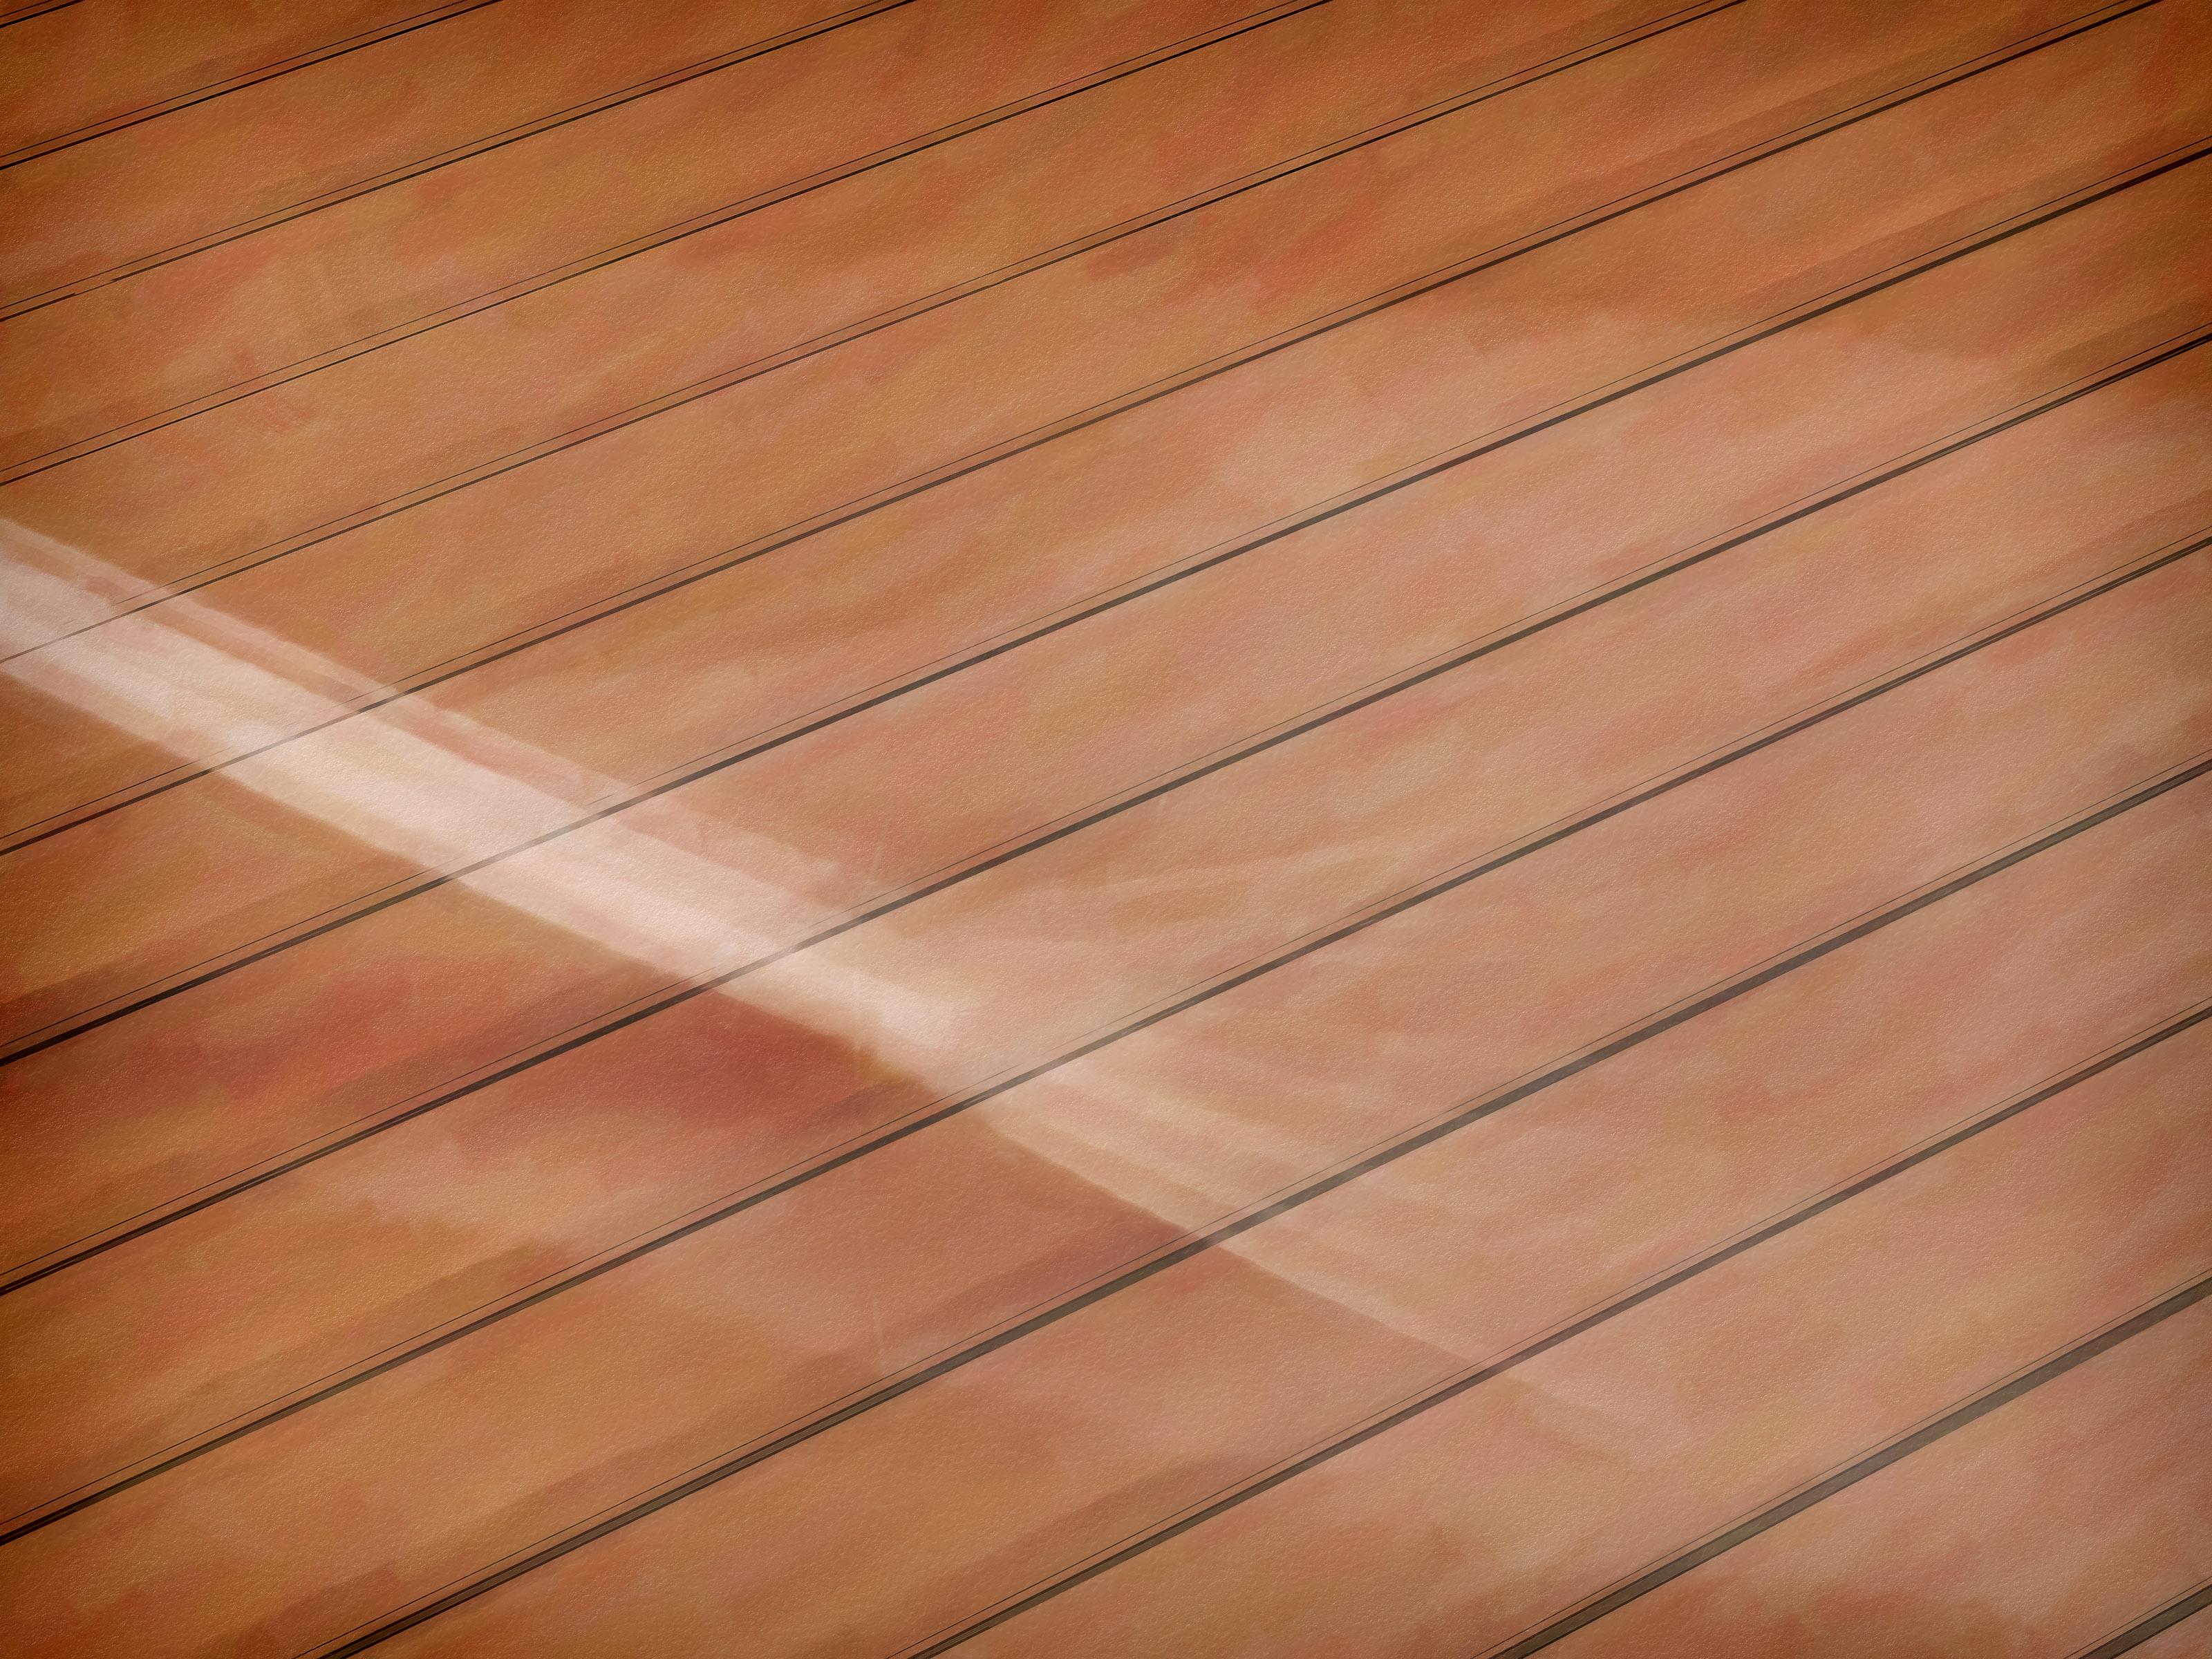 Trex Deck Ideas